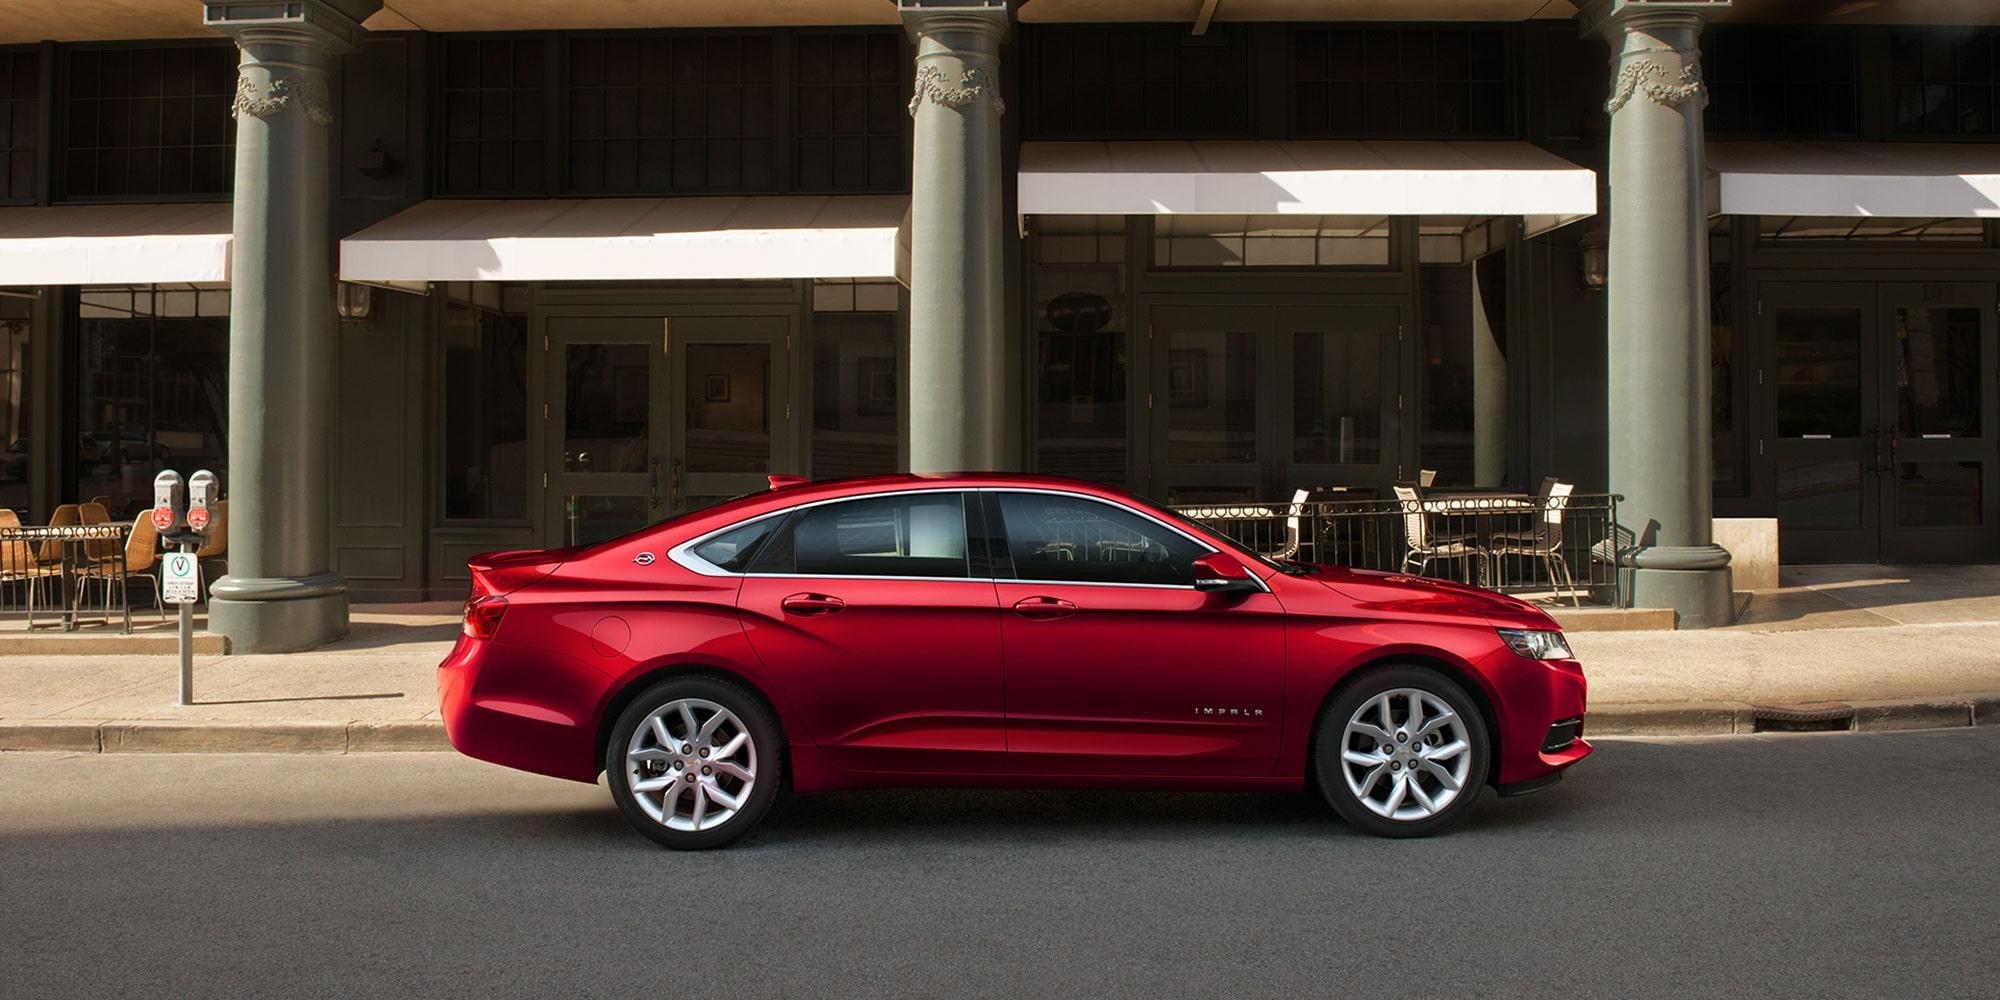 2019 Impala Full Size Car Design: Side Profile